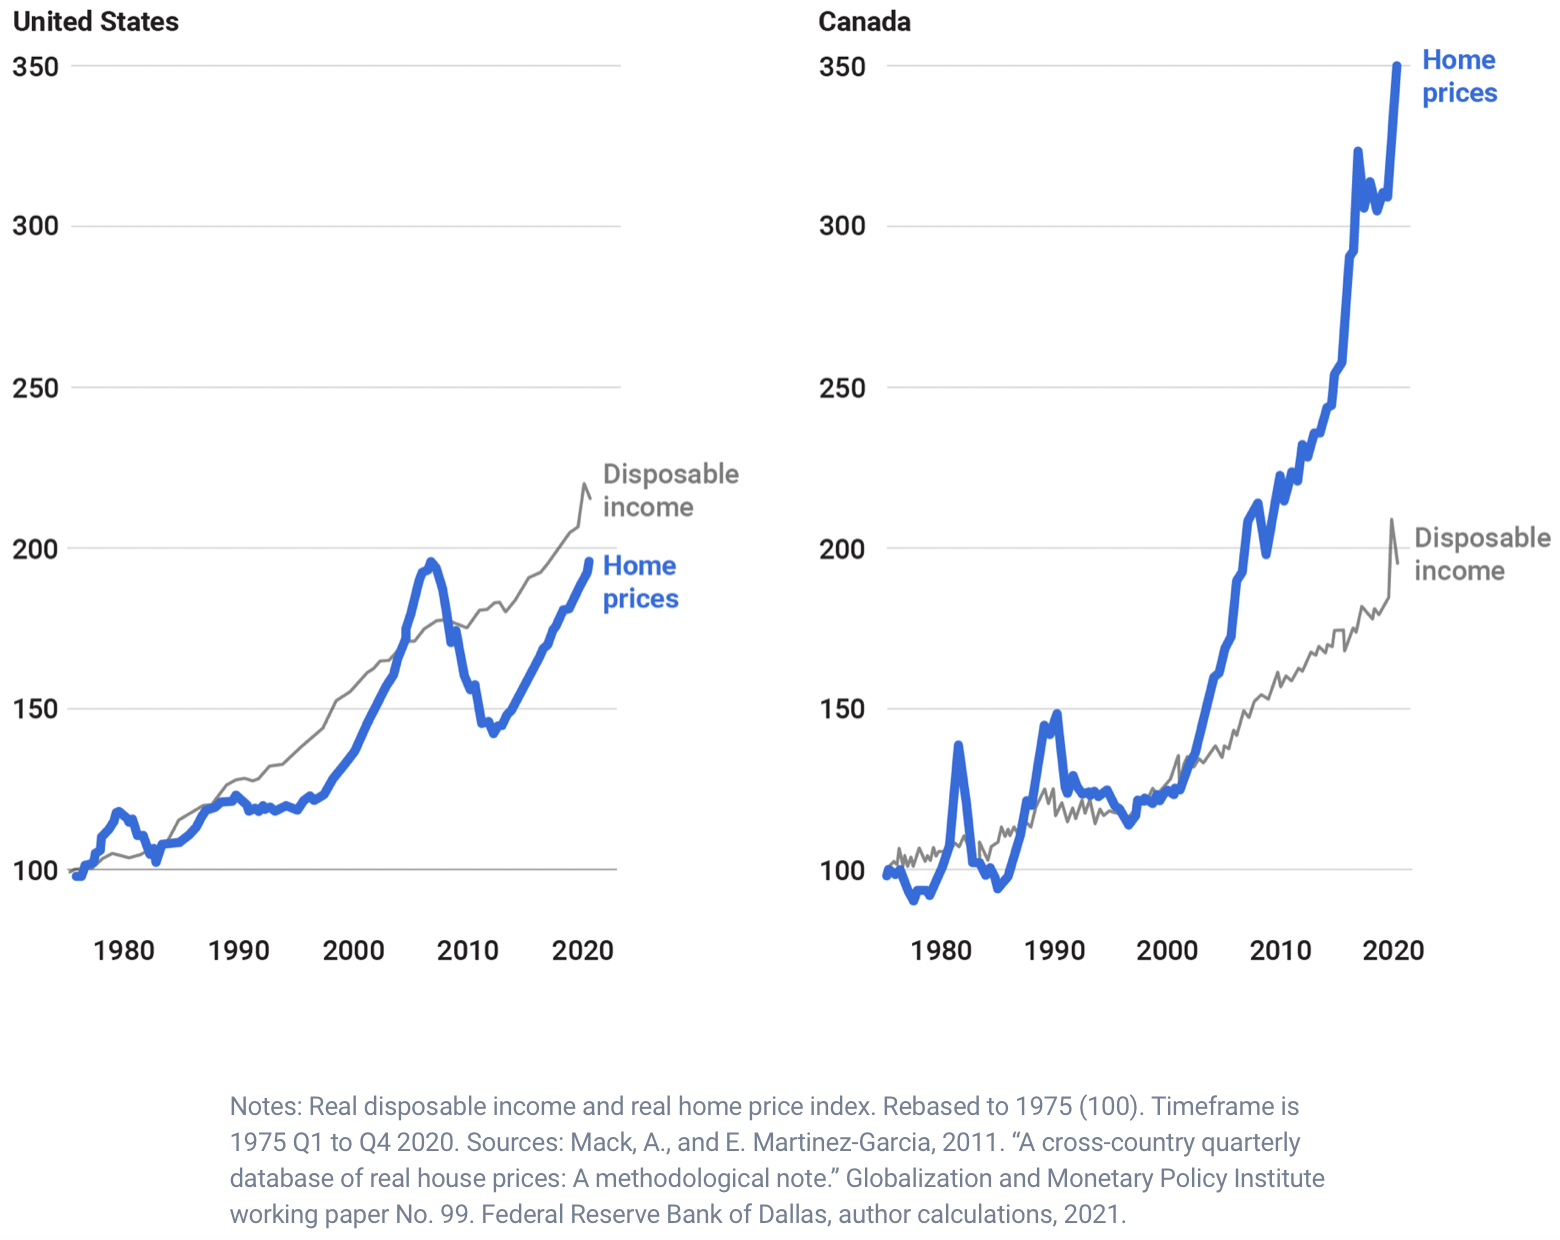 United States housing market versus the Canadian housing market